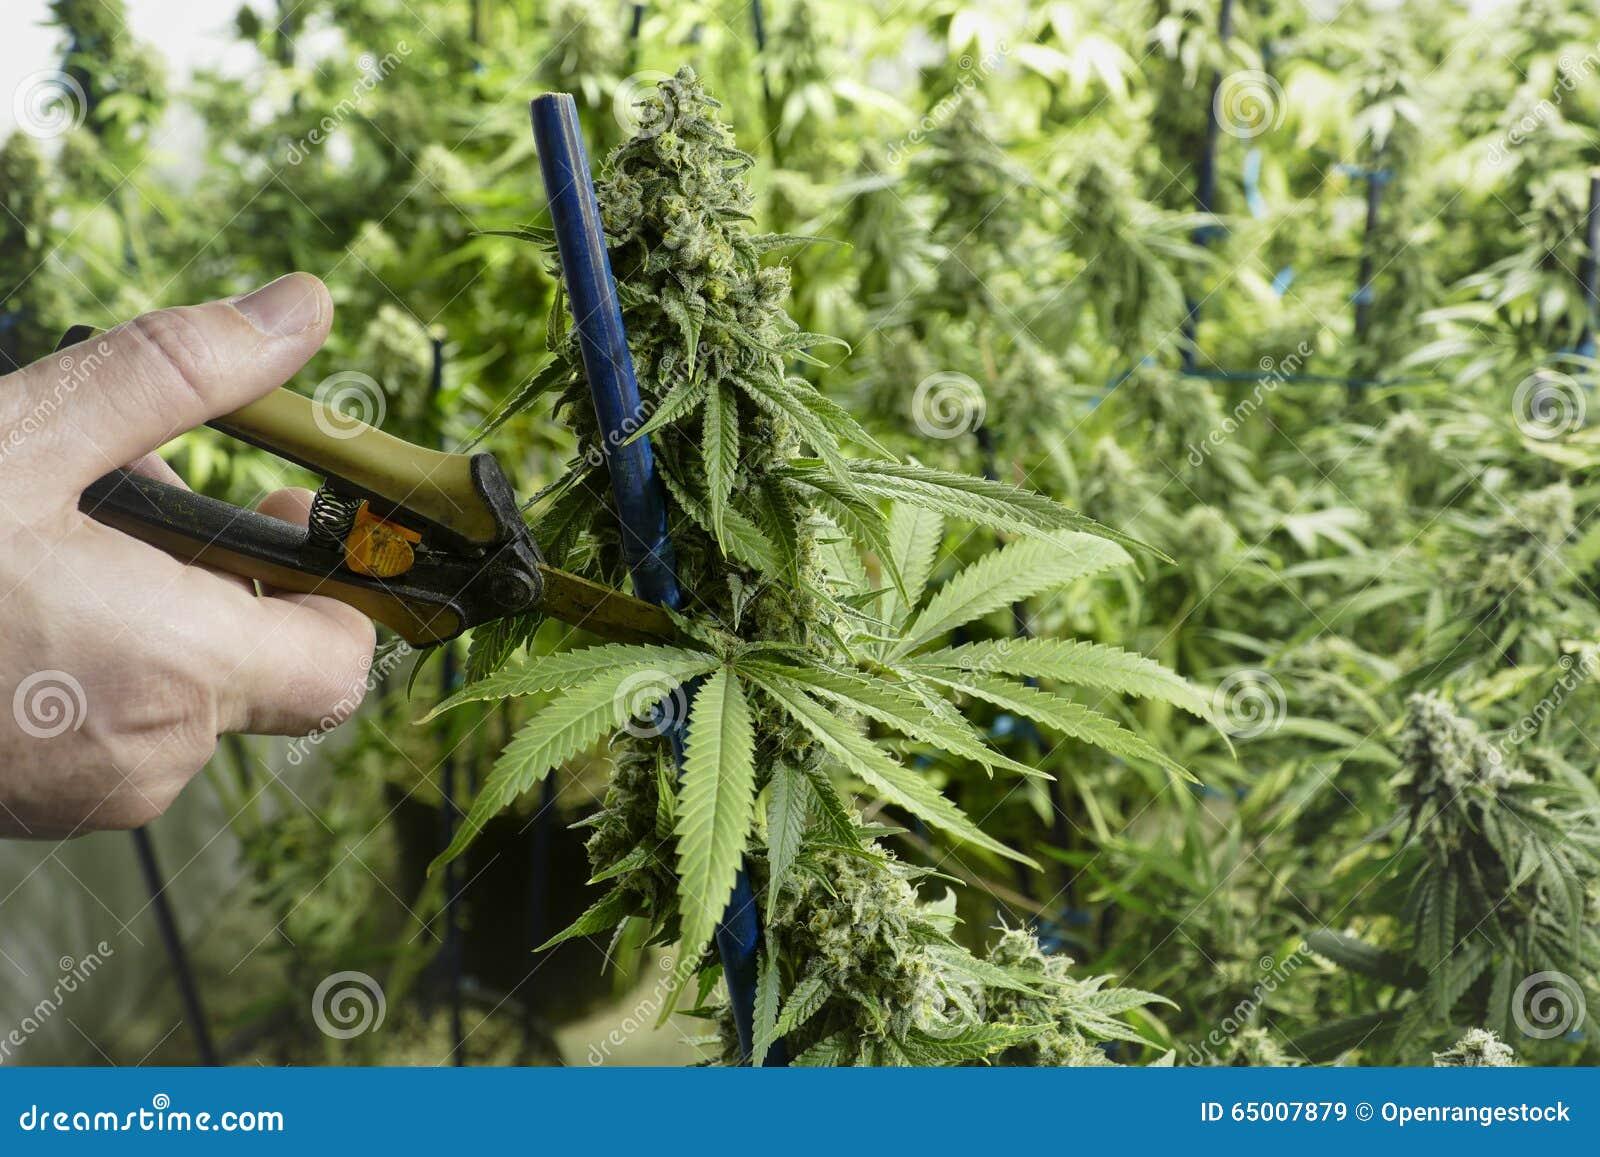 trimming medical cannabis medicine stock photography 80382356. Black Bedroom Furniture Sets. Home Design Ideas